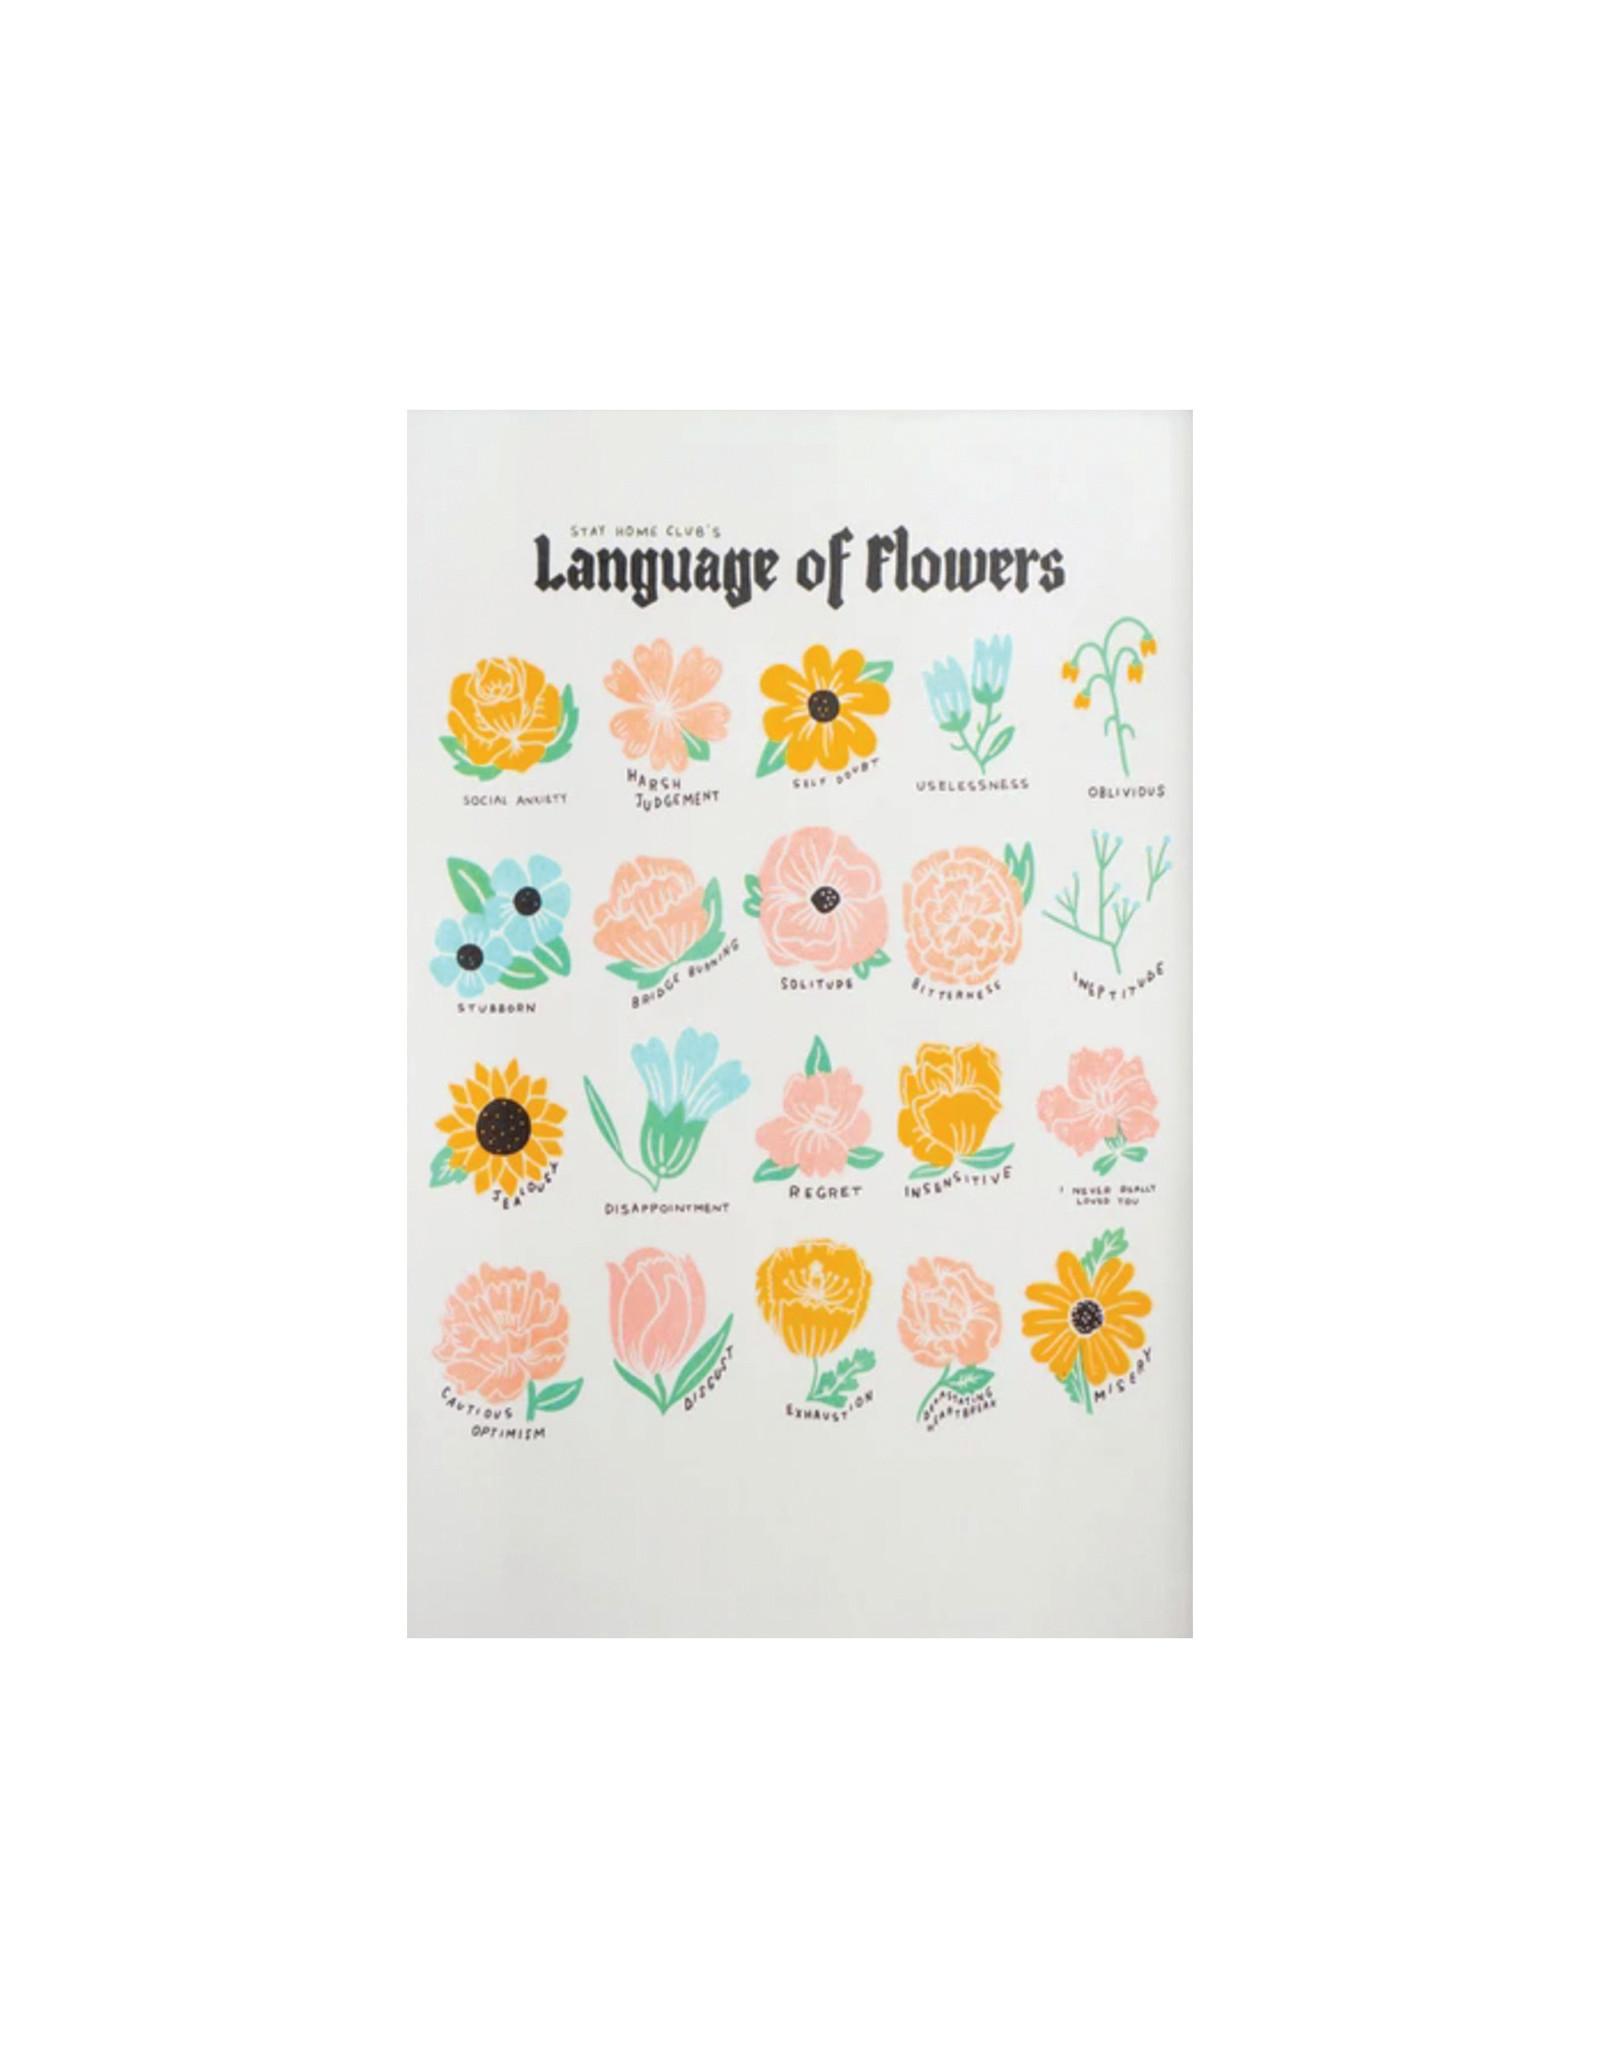 Stay Home Club Language of Flowers Riso Print 11 x 17